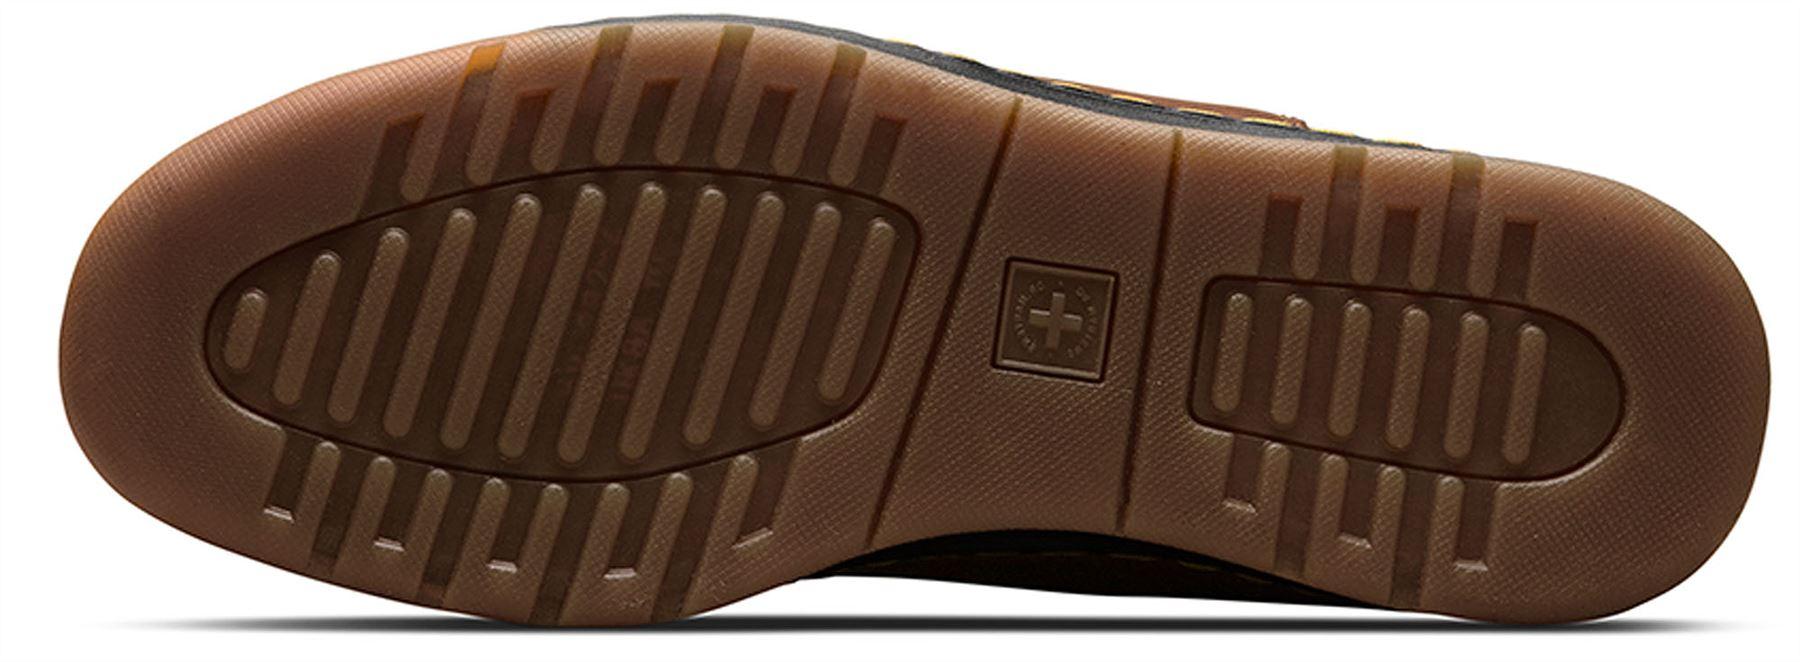 Dr Martens  Luxor Uomo Grayson Softwair Tan Luxor  Leder Chelsea Dealer Boot 9560c5